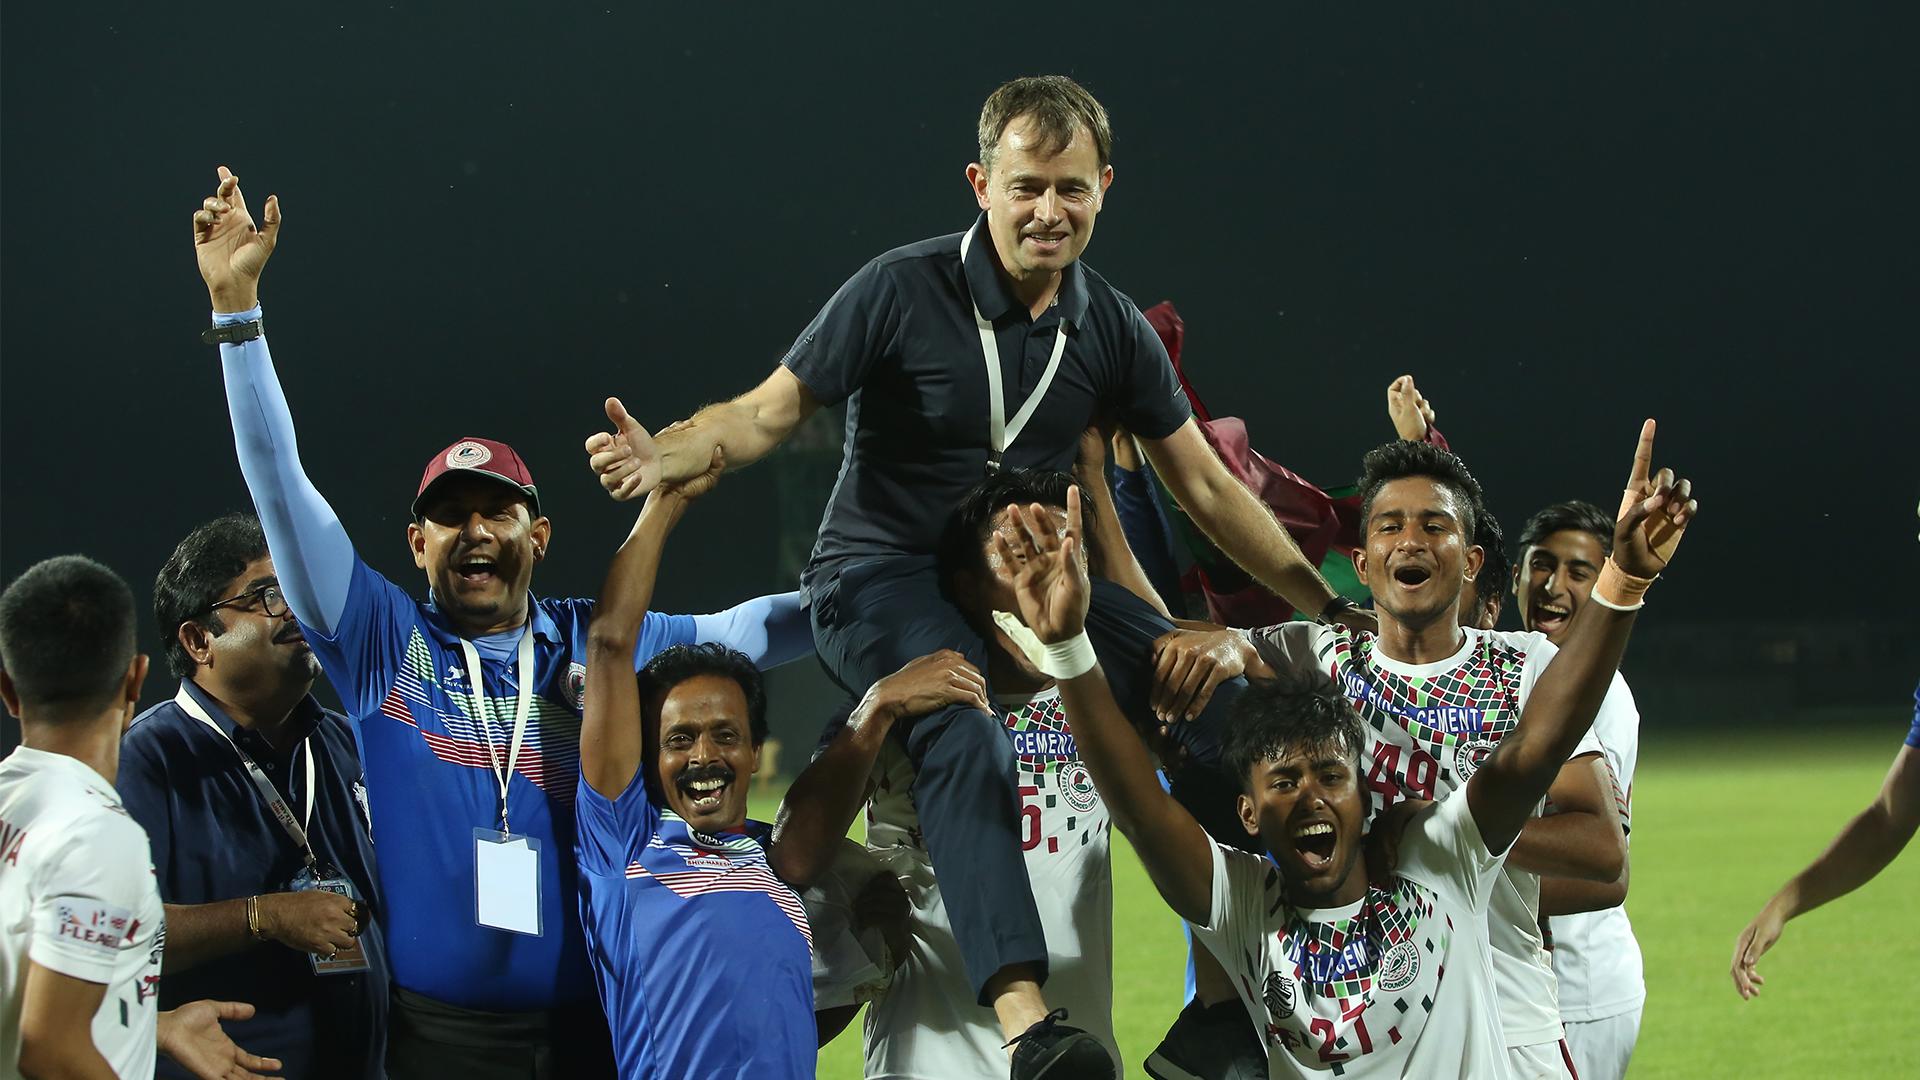 Former Mohun Bagan and Kerala Blasters coach Kibu Vicuna joins Polish second division side LKS Lodz